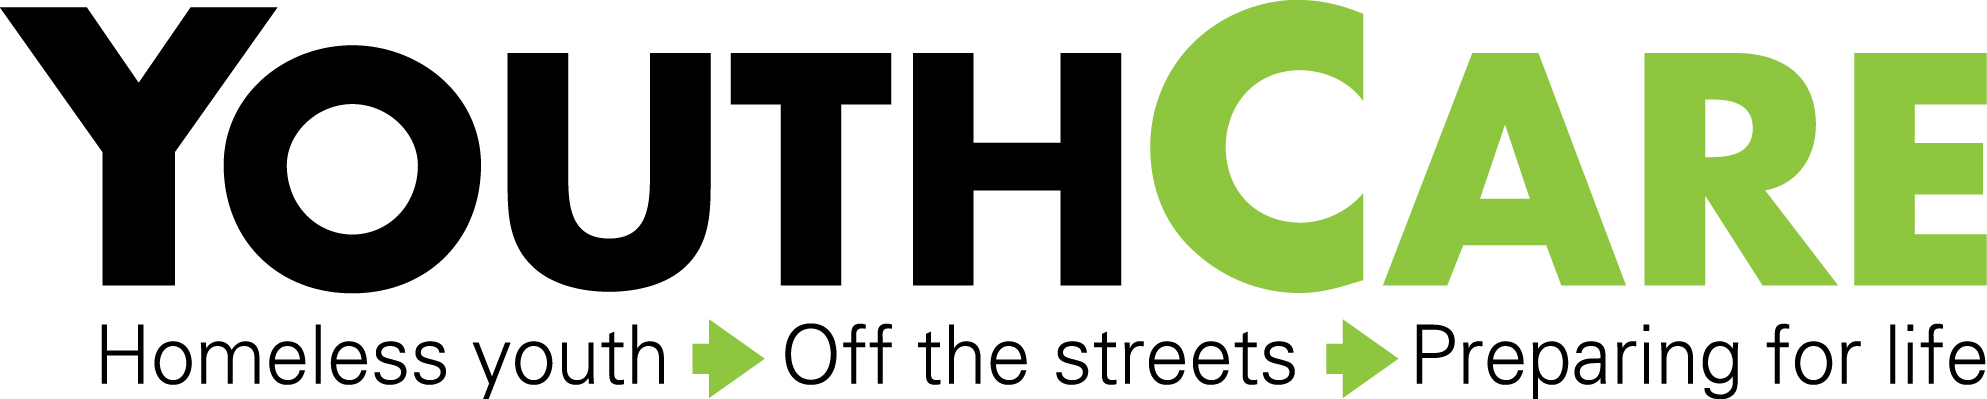 YouthCare Logo Print Quality.jpg